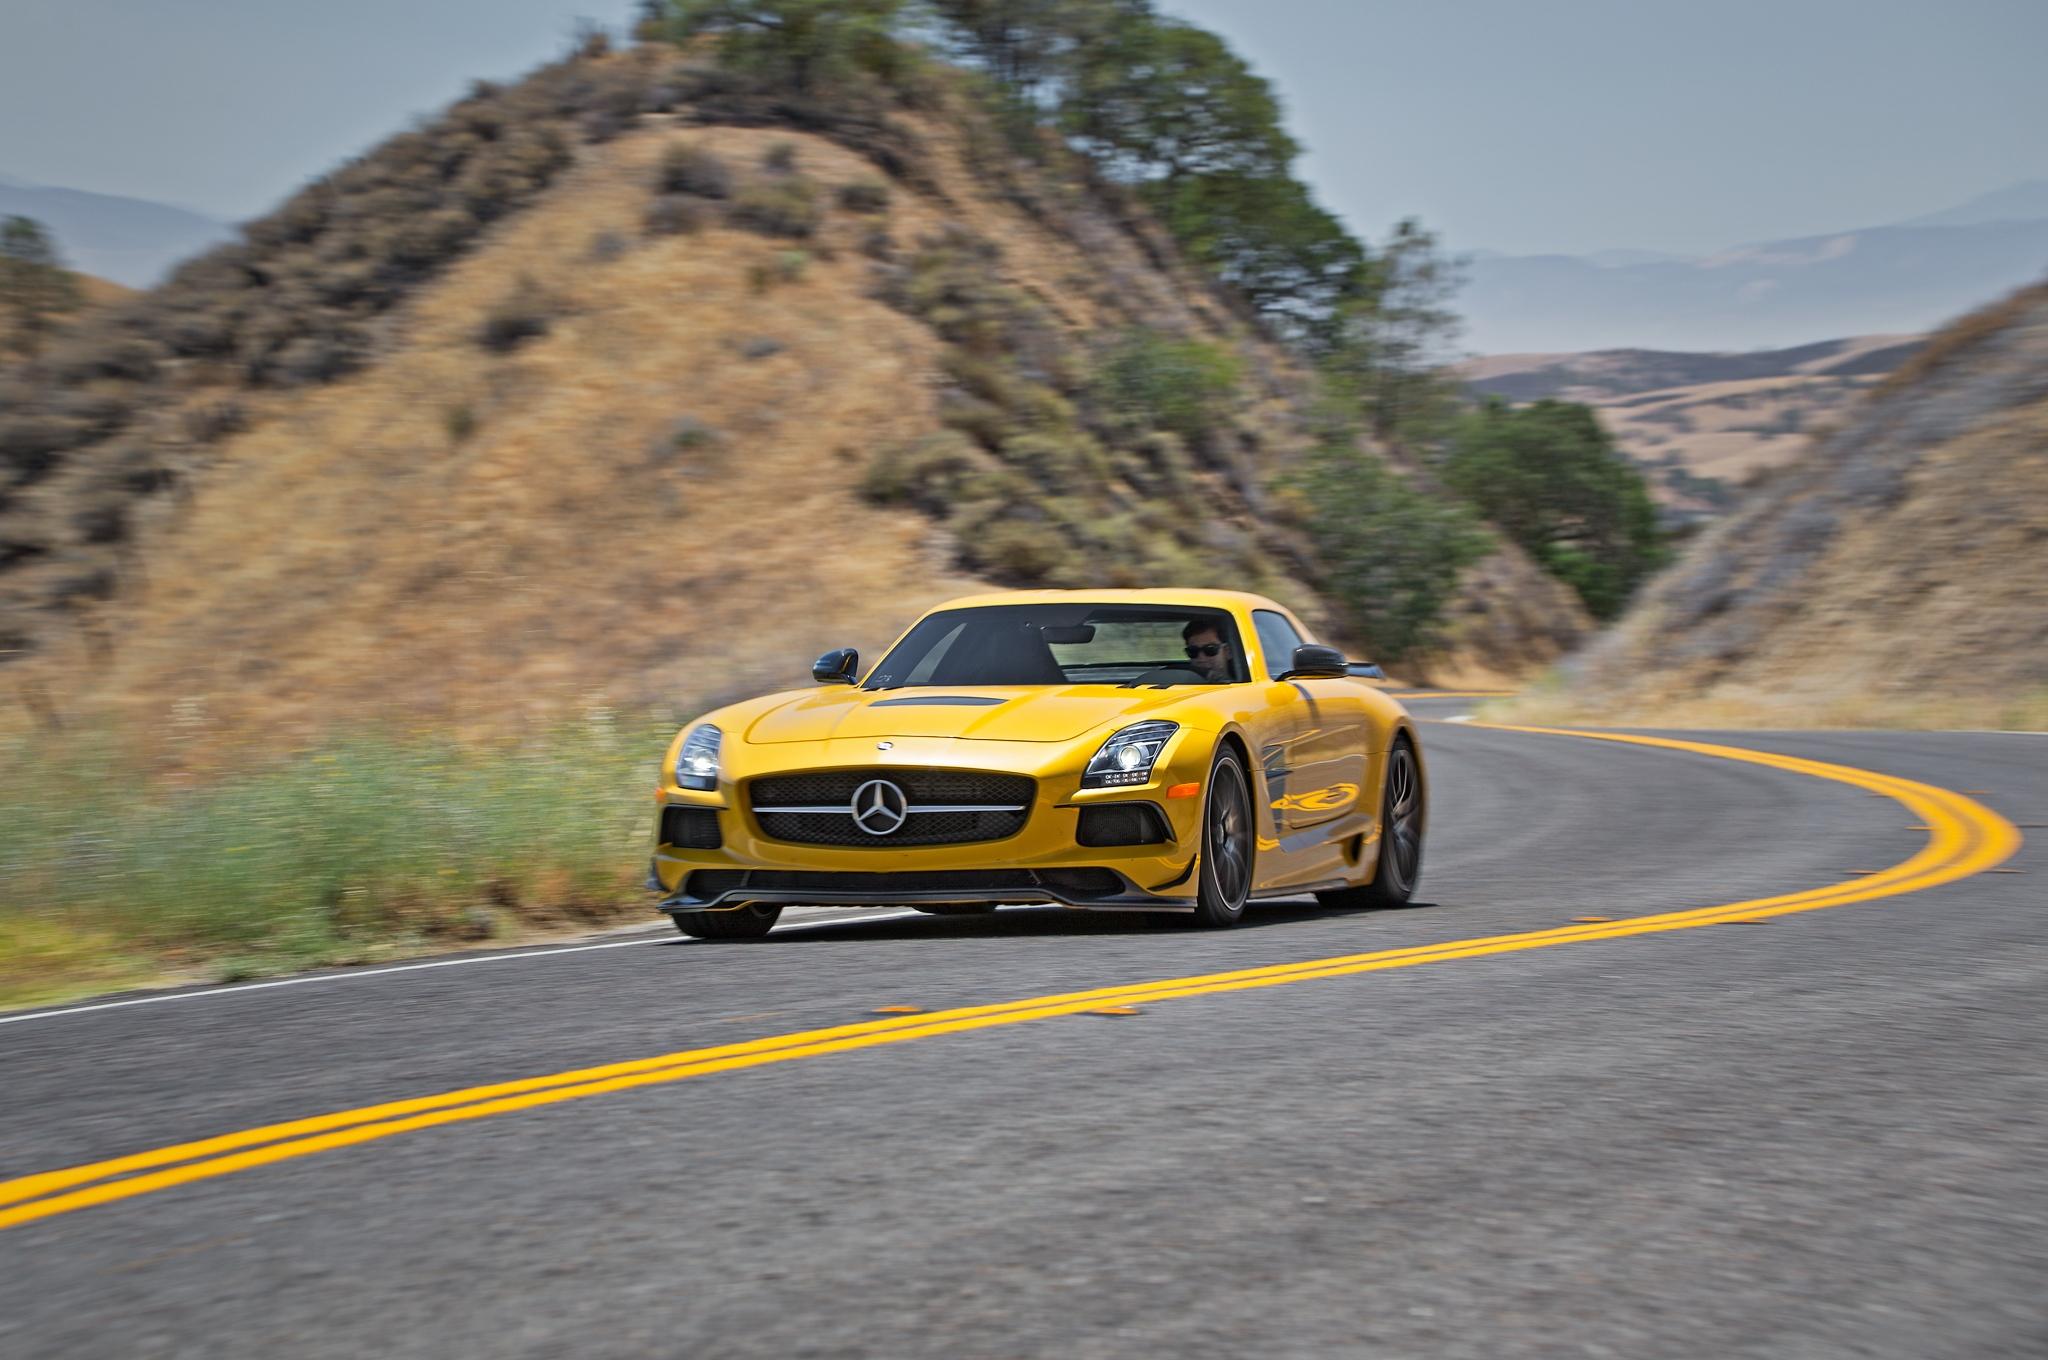 2014-Mercedes-Benz-SLS-AMG-Black-Series-front-end-in-motion